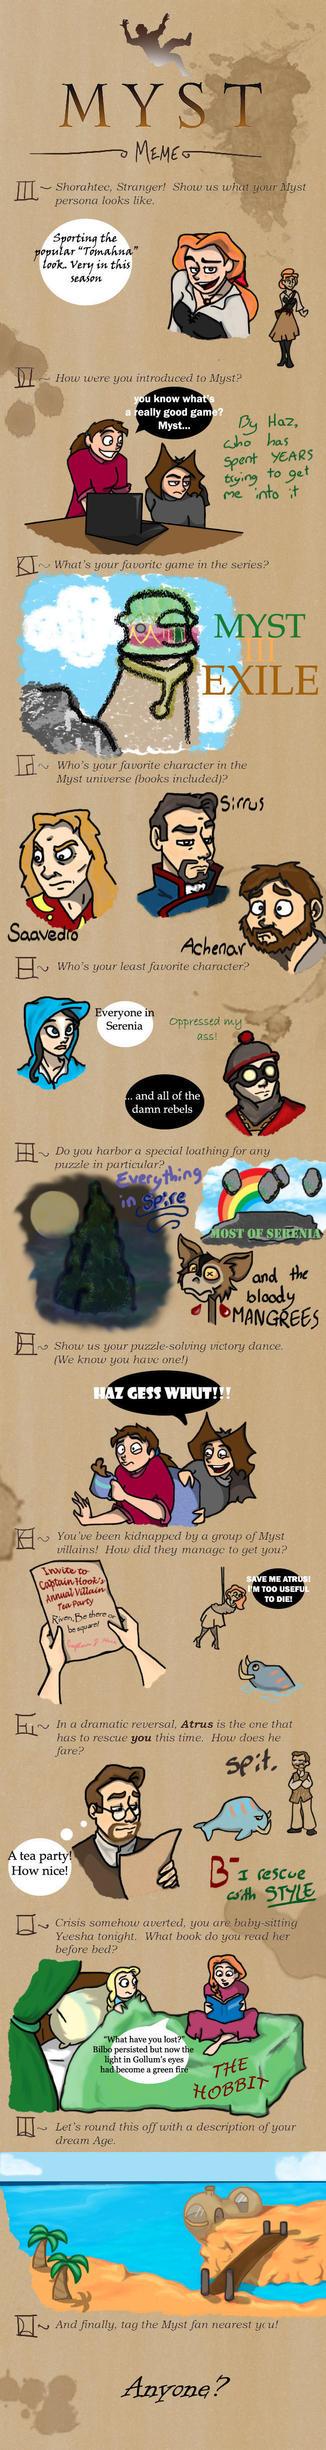 Myst Meme by Petlamb